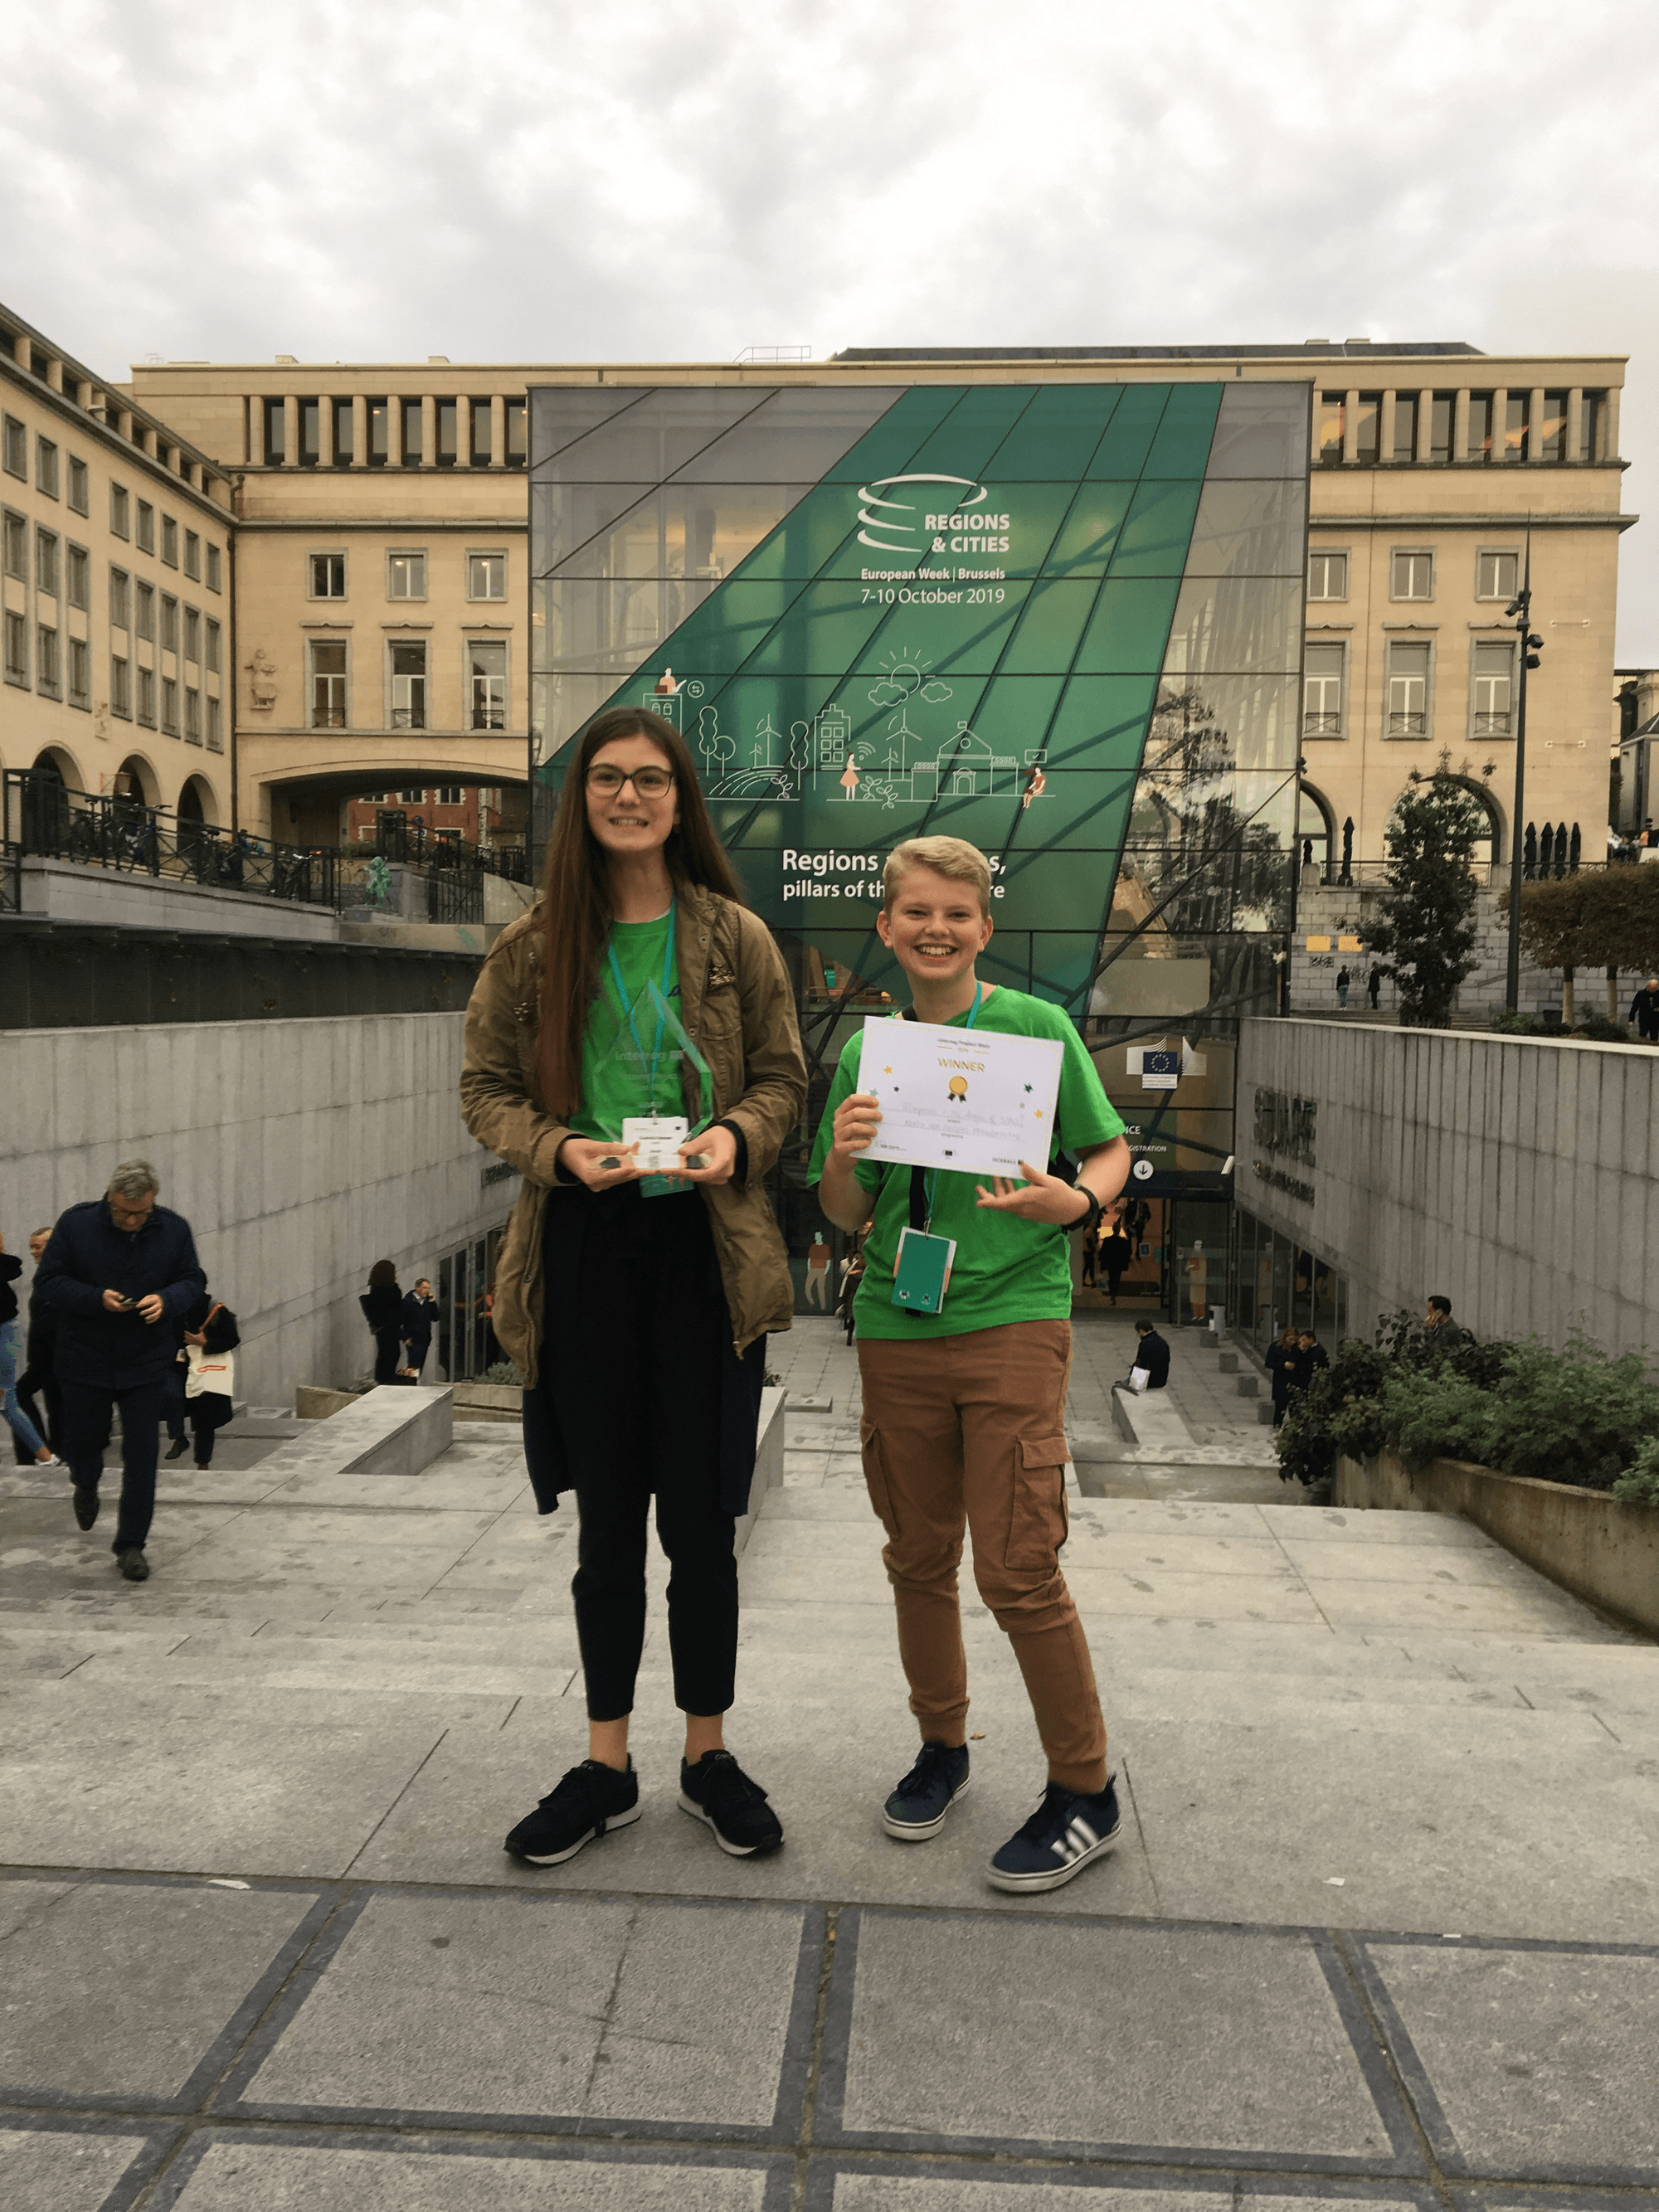 Scholenproject 2IMPREZS wint Europese trofee in Brussel